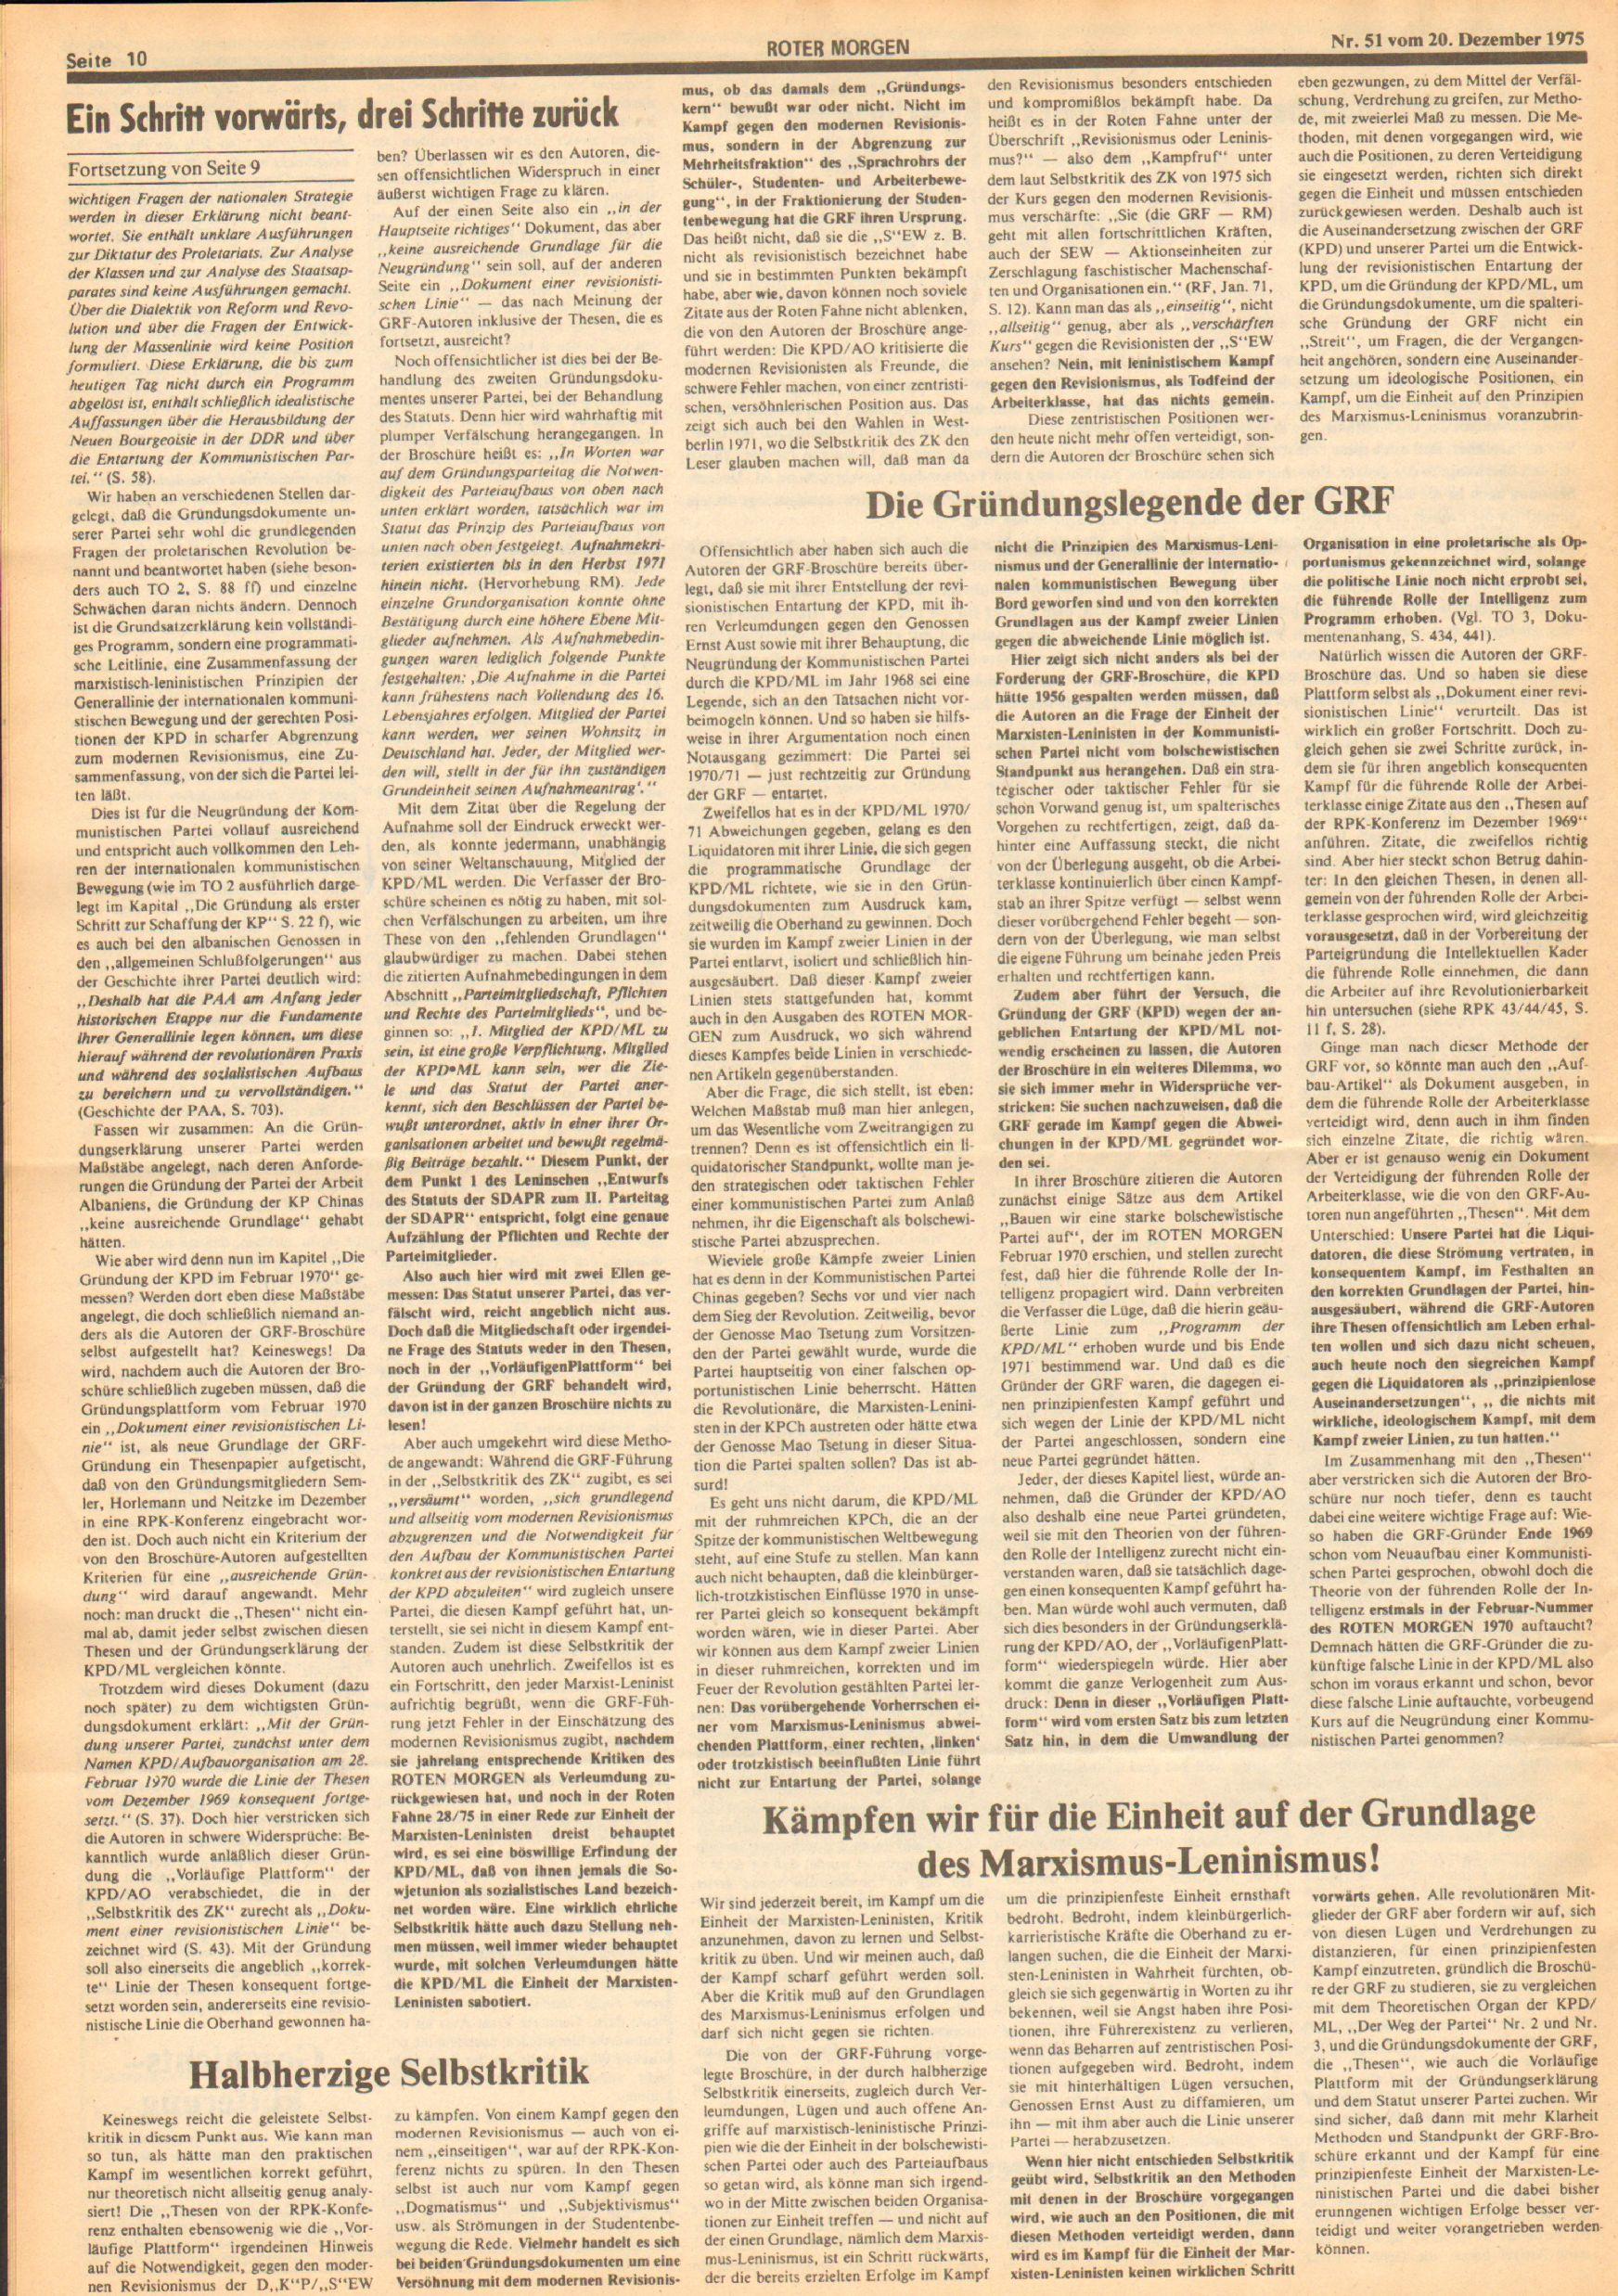 Roter Morgen, 9. Jg., 20. Dezember 1975, Nr. 51, Seite 10